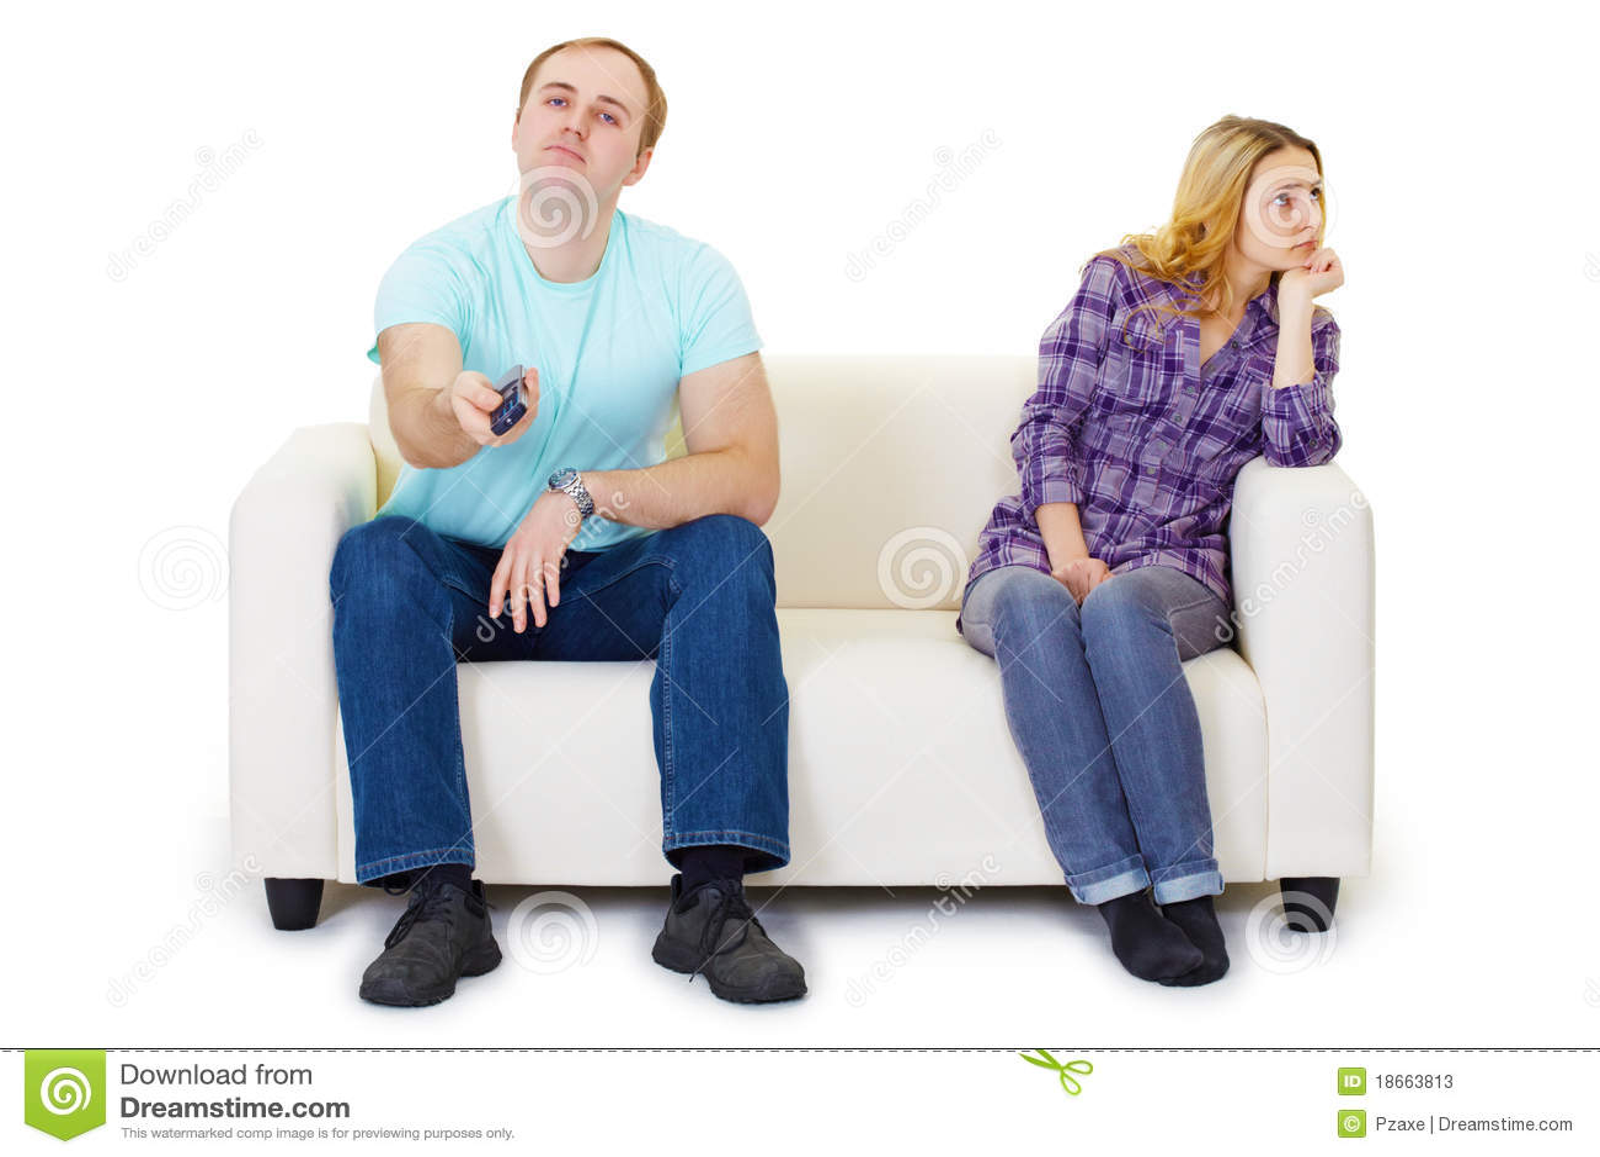 https://thumbs.dreamstime.com/z/husband-wife-quarrel-18663813.jpg